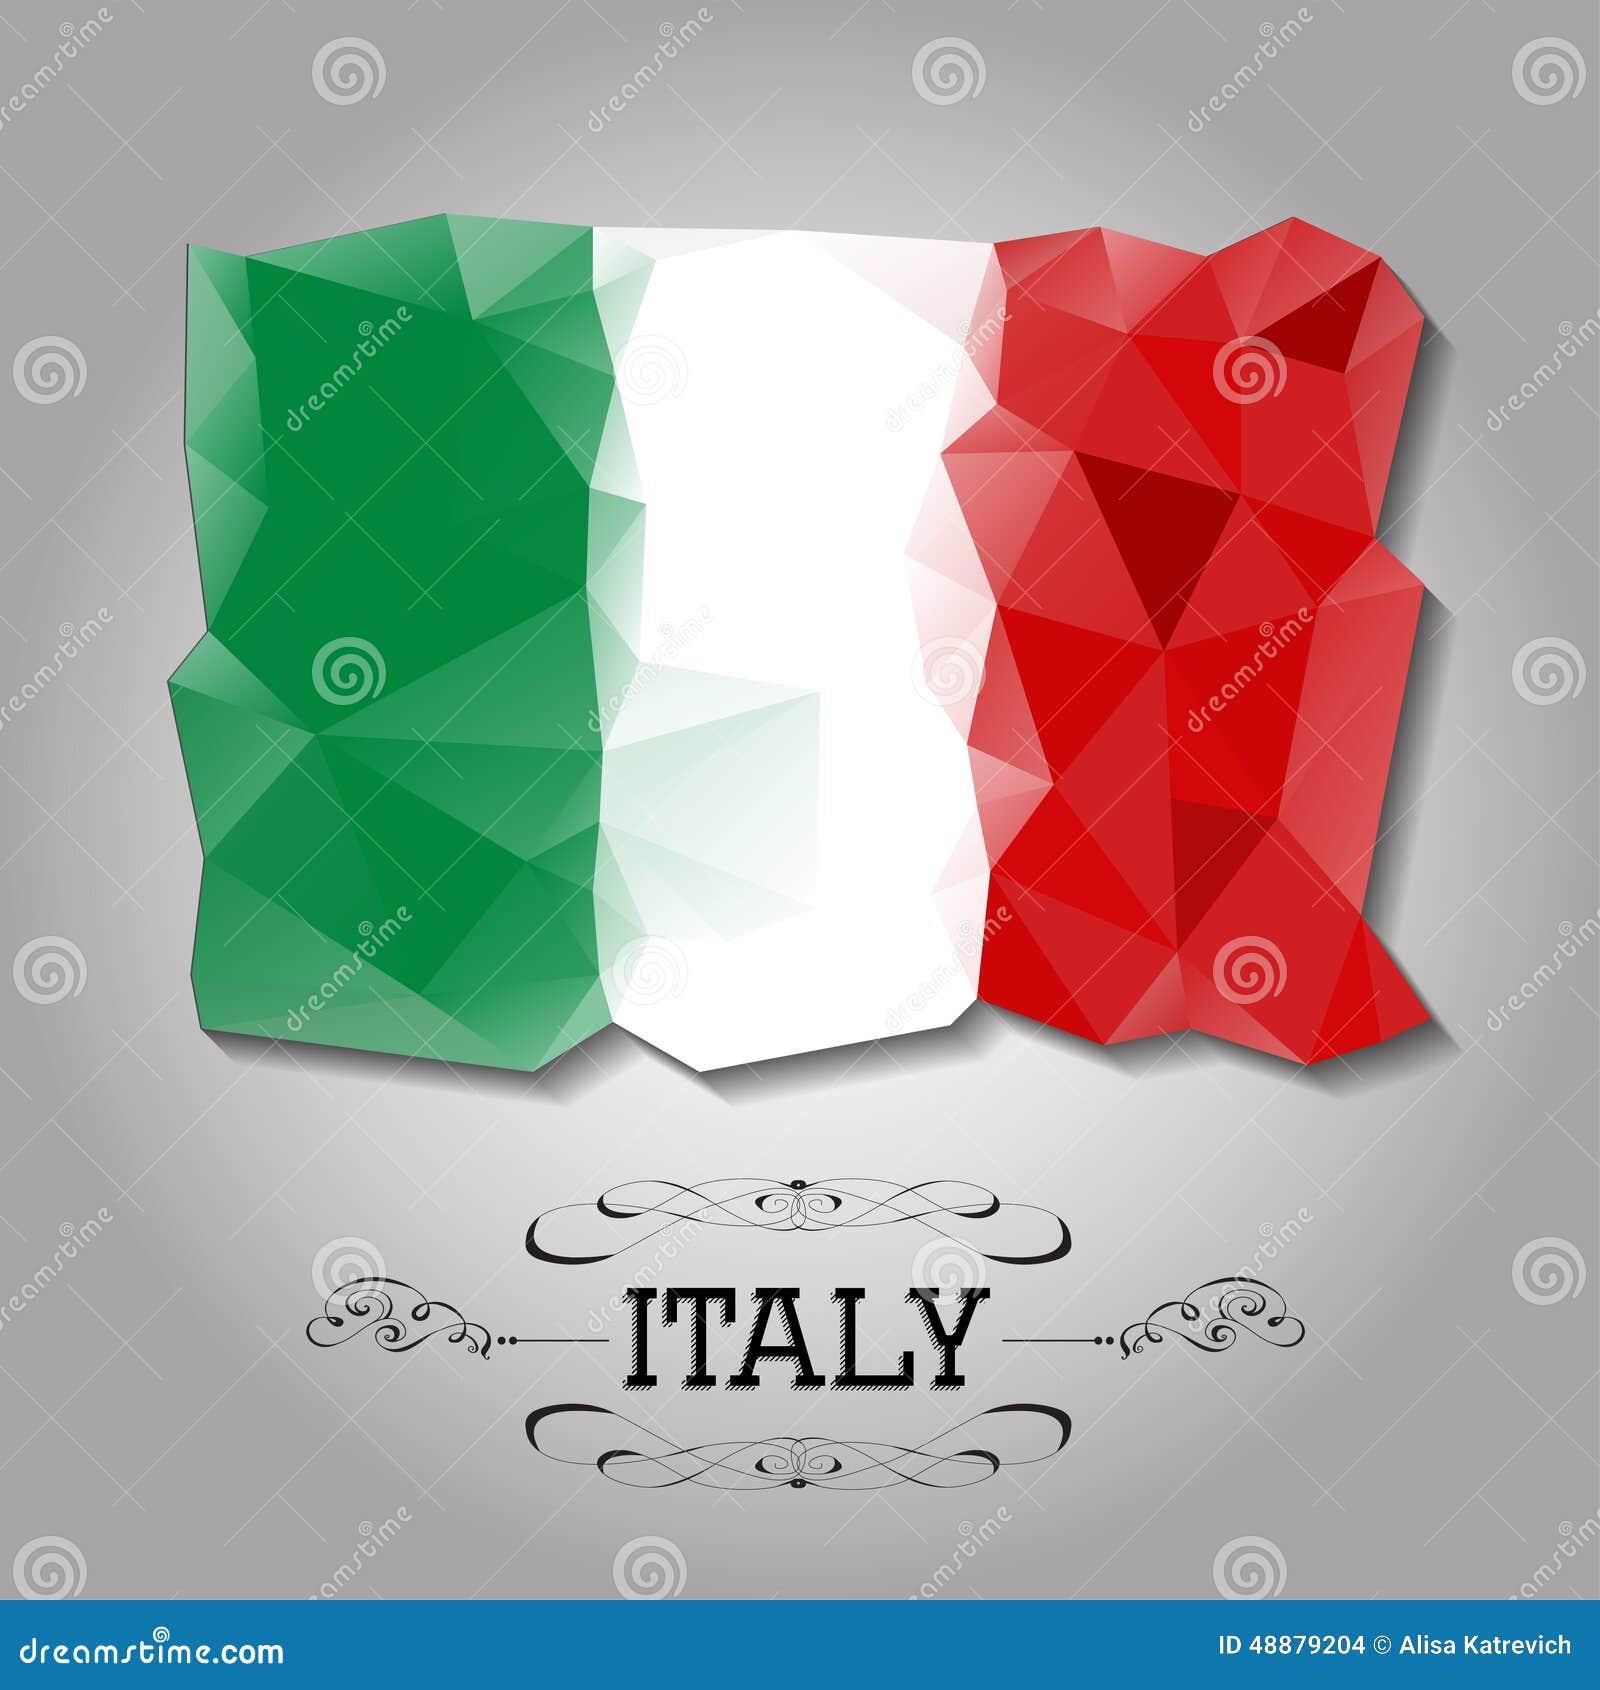 Vector geometric polygonal italy flag stock vector for Italy design